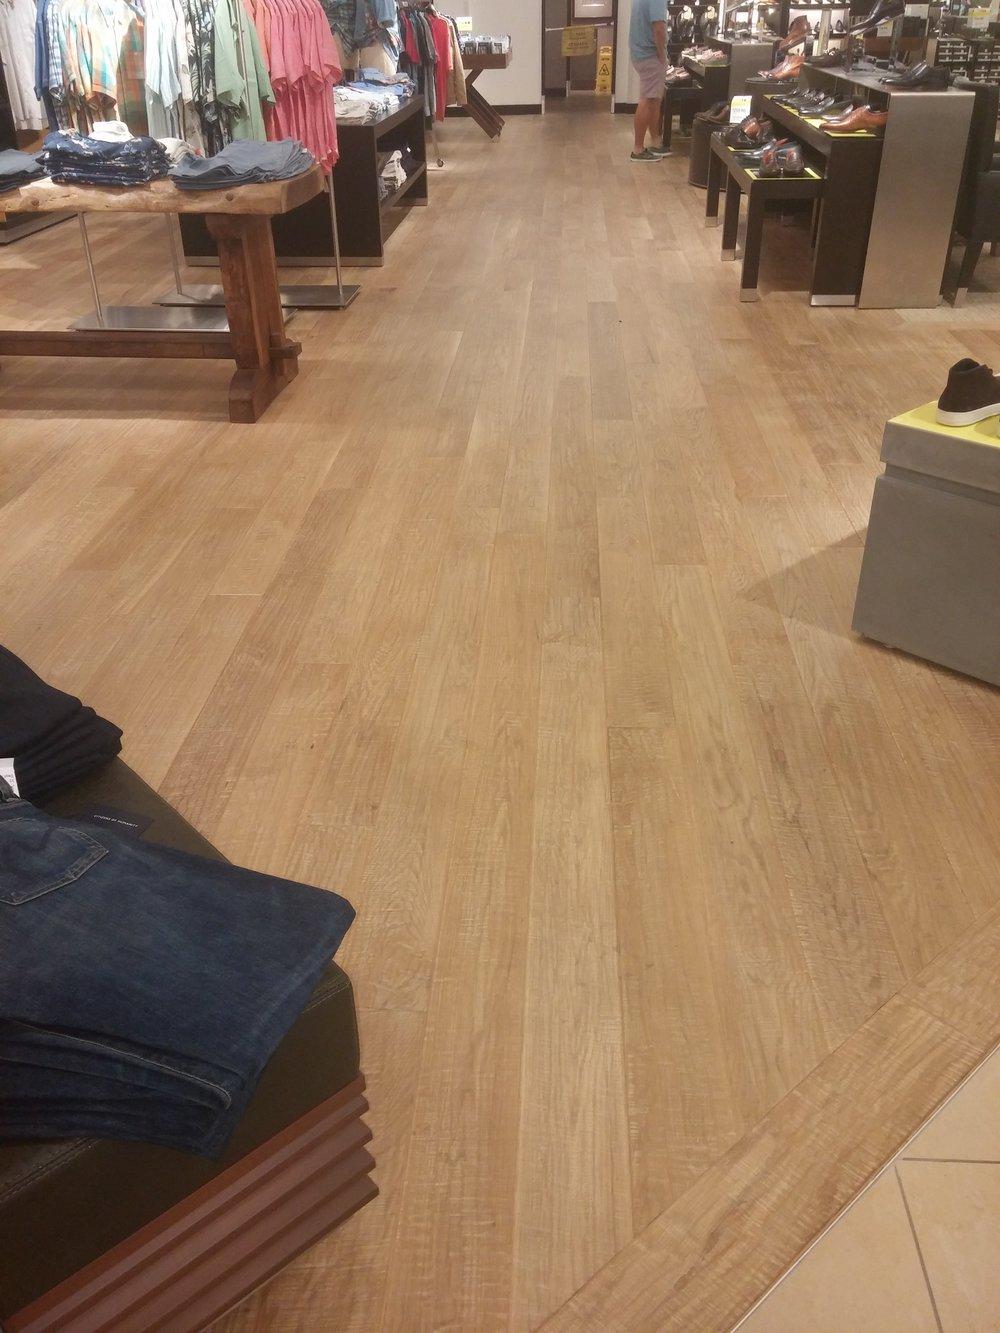 Major Retail-0010.jpg